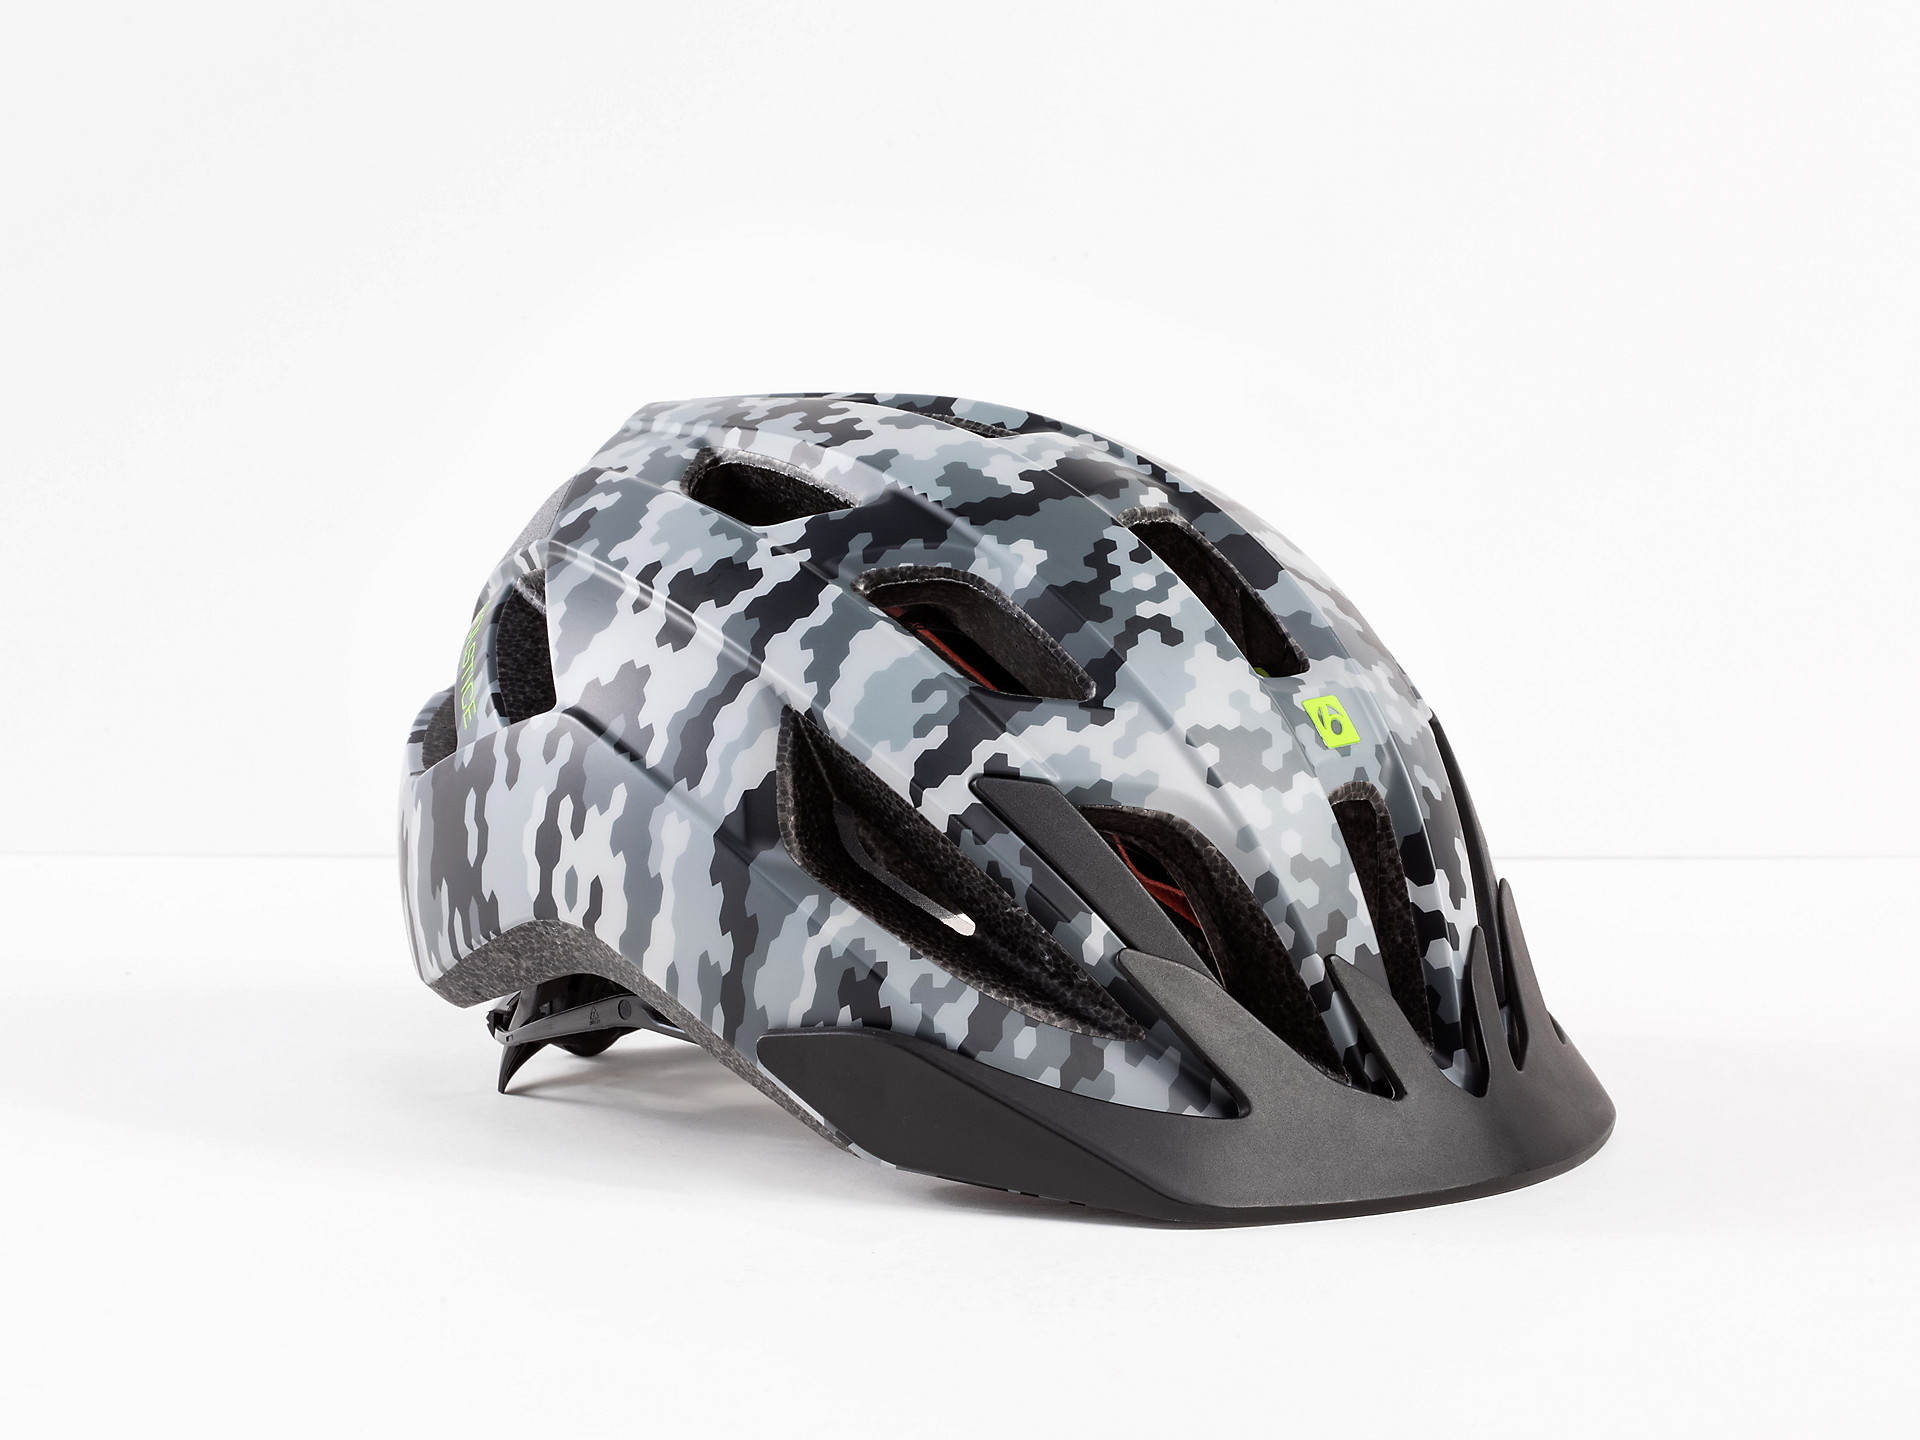 Topmoderne Cykelhjelme | Trek Bikes (DK) NT-76